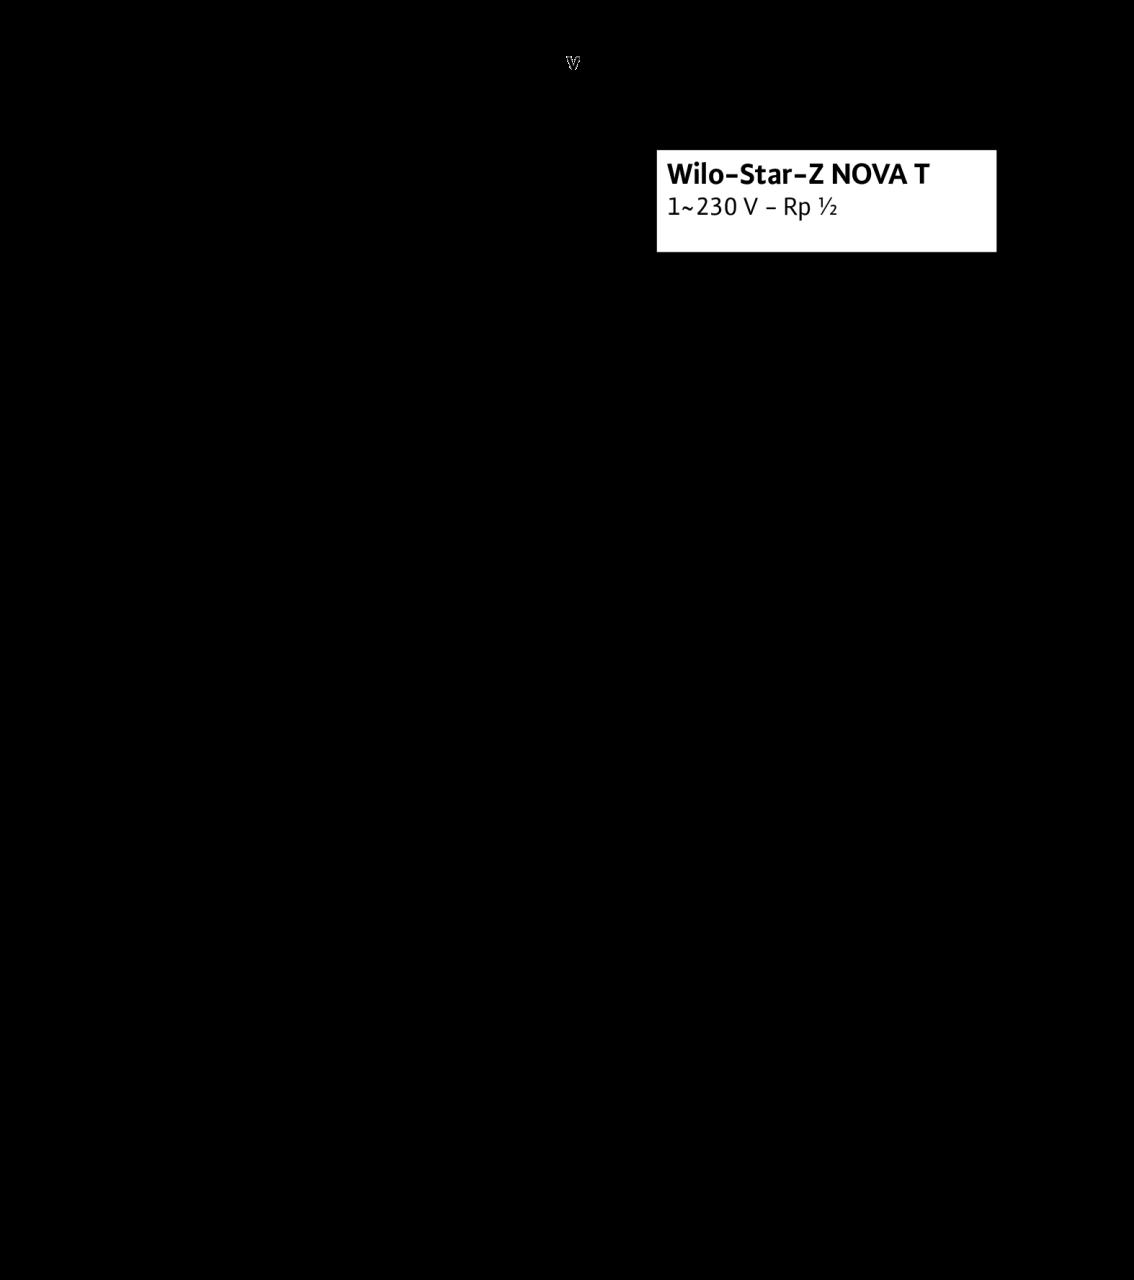 Wilo Star-Z NOVA - výkonová křivka